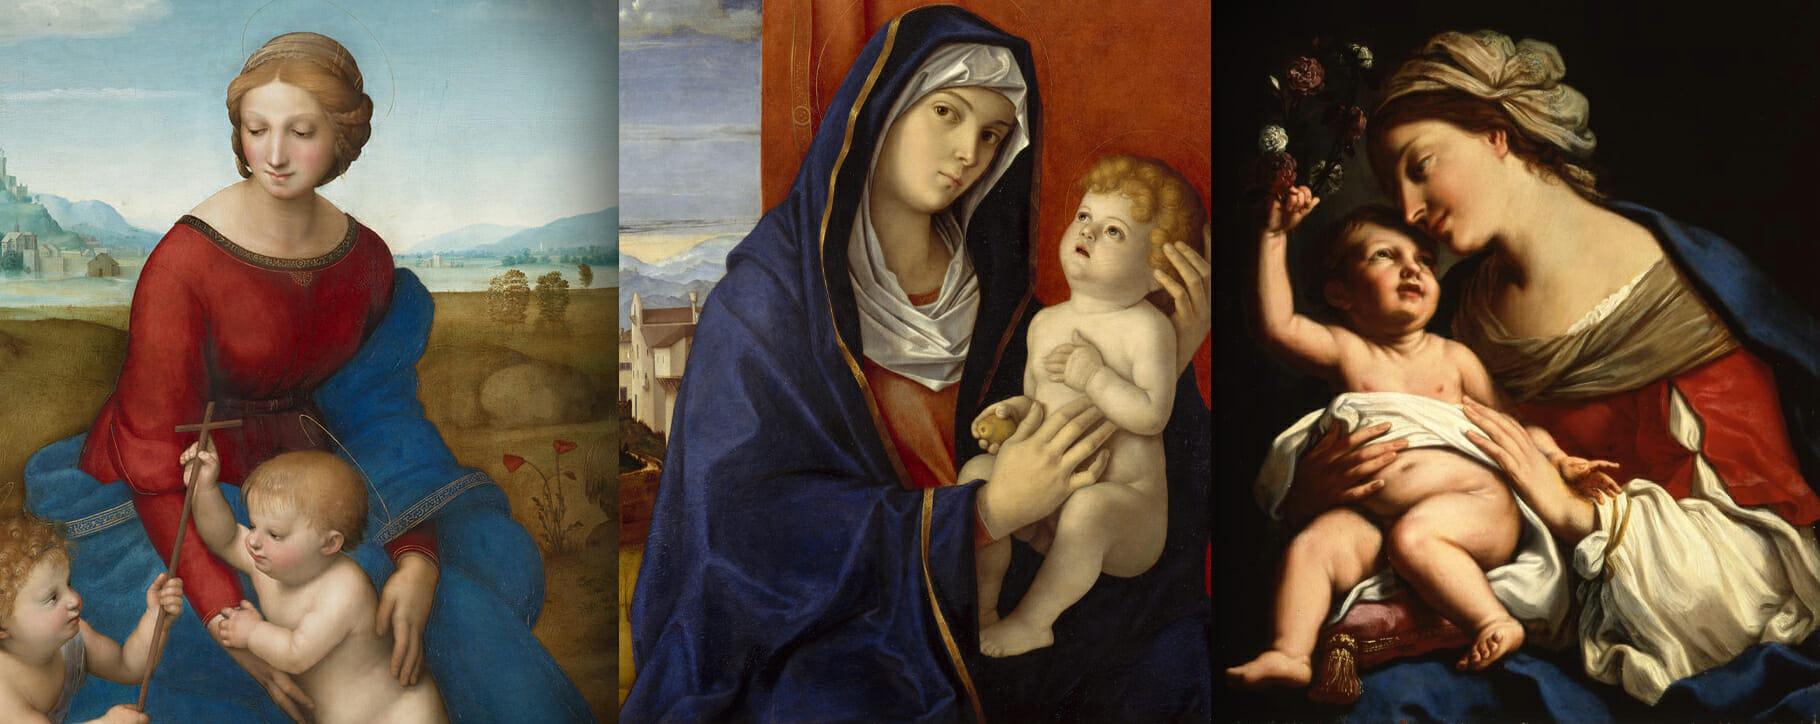 Ultramarine Virgin Mary